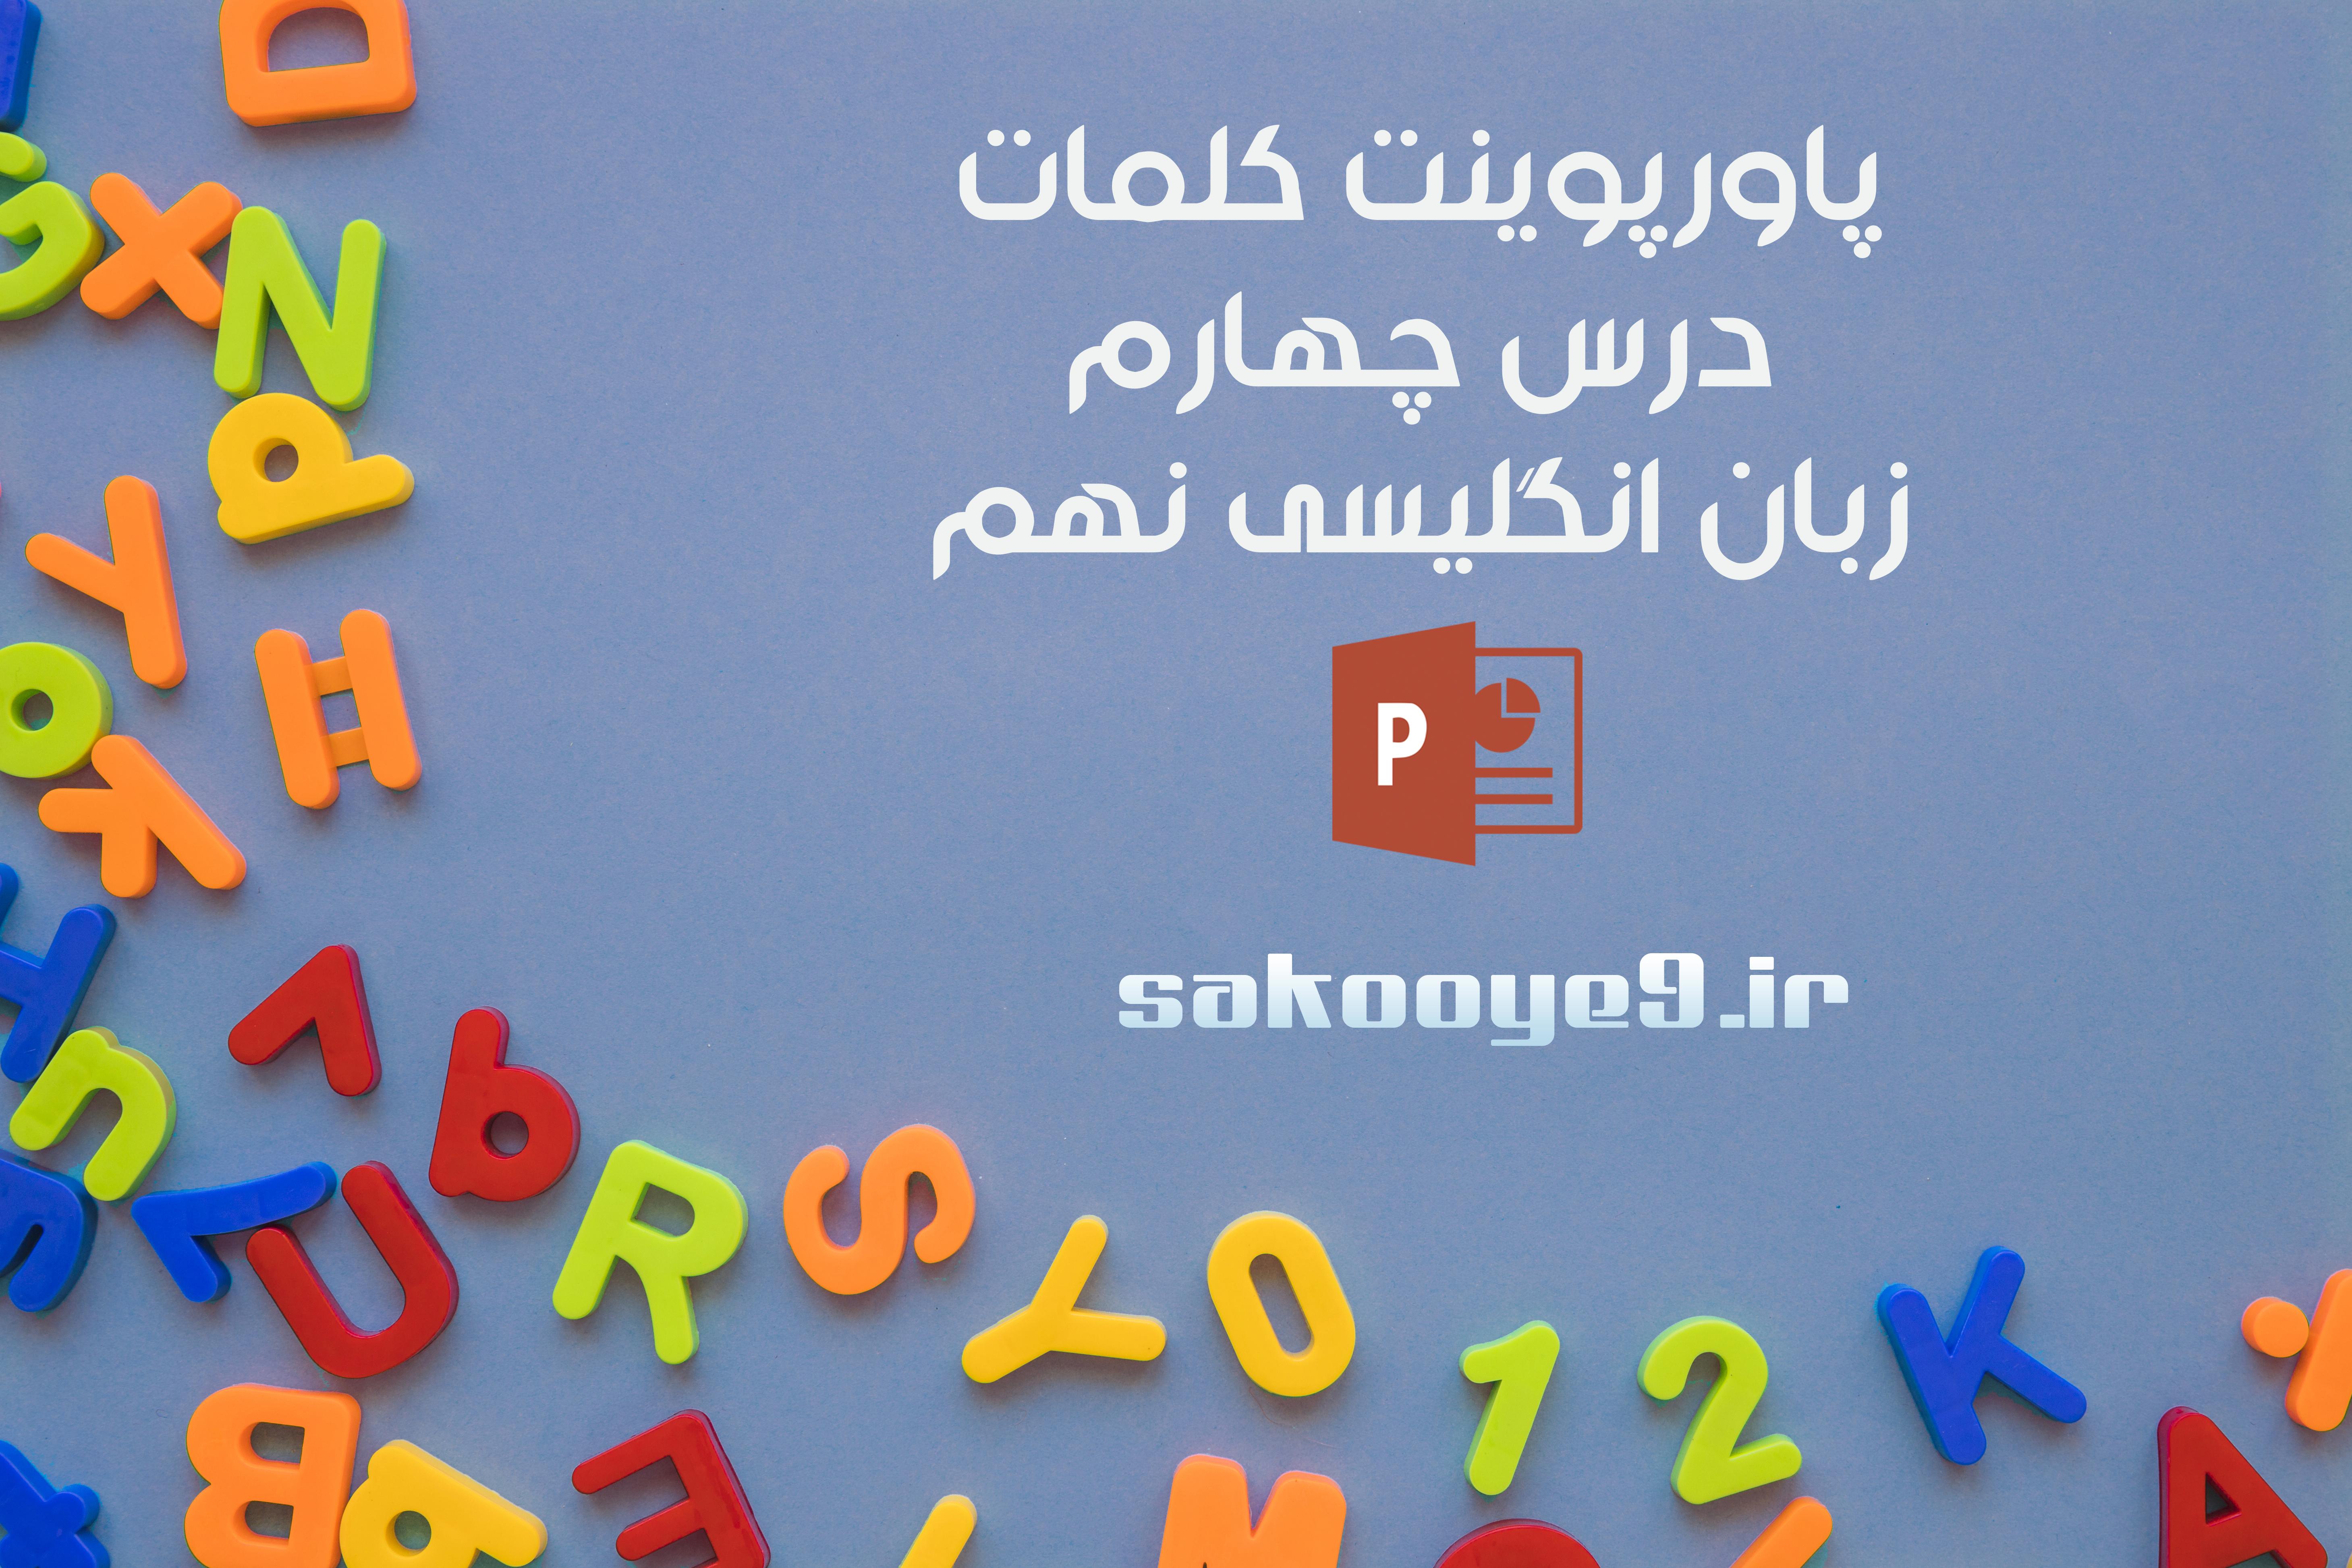 پاورپوینت کلمات درس چهارم زبان انگلیسی نهم